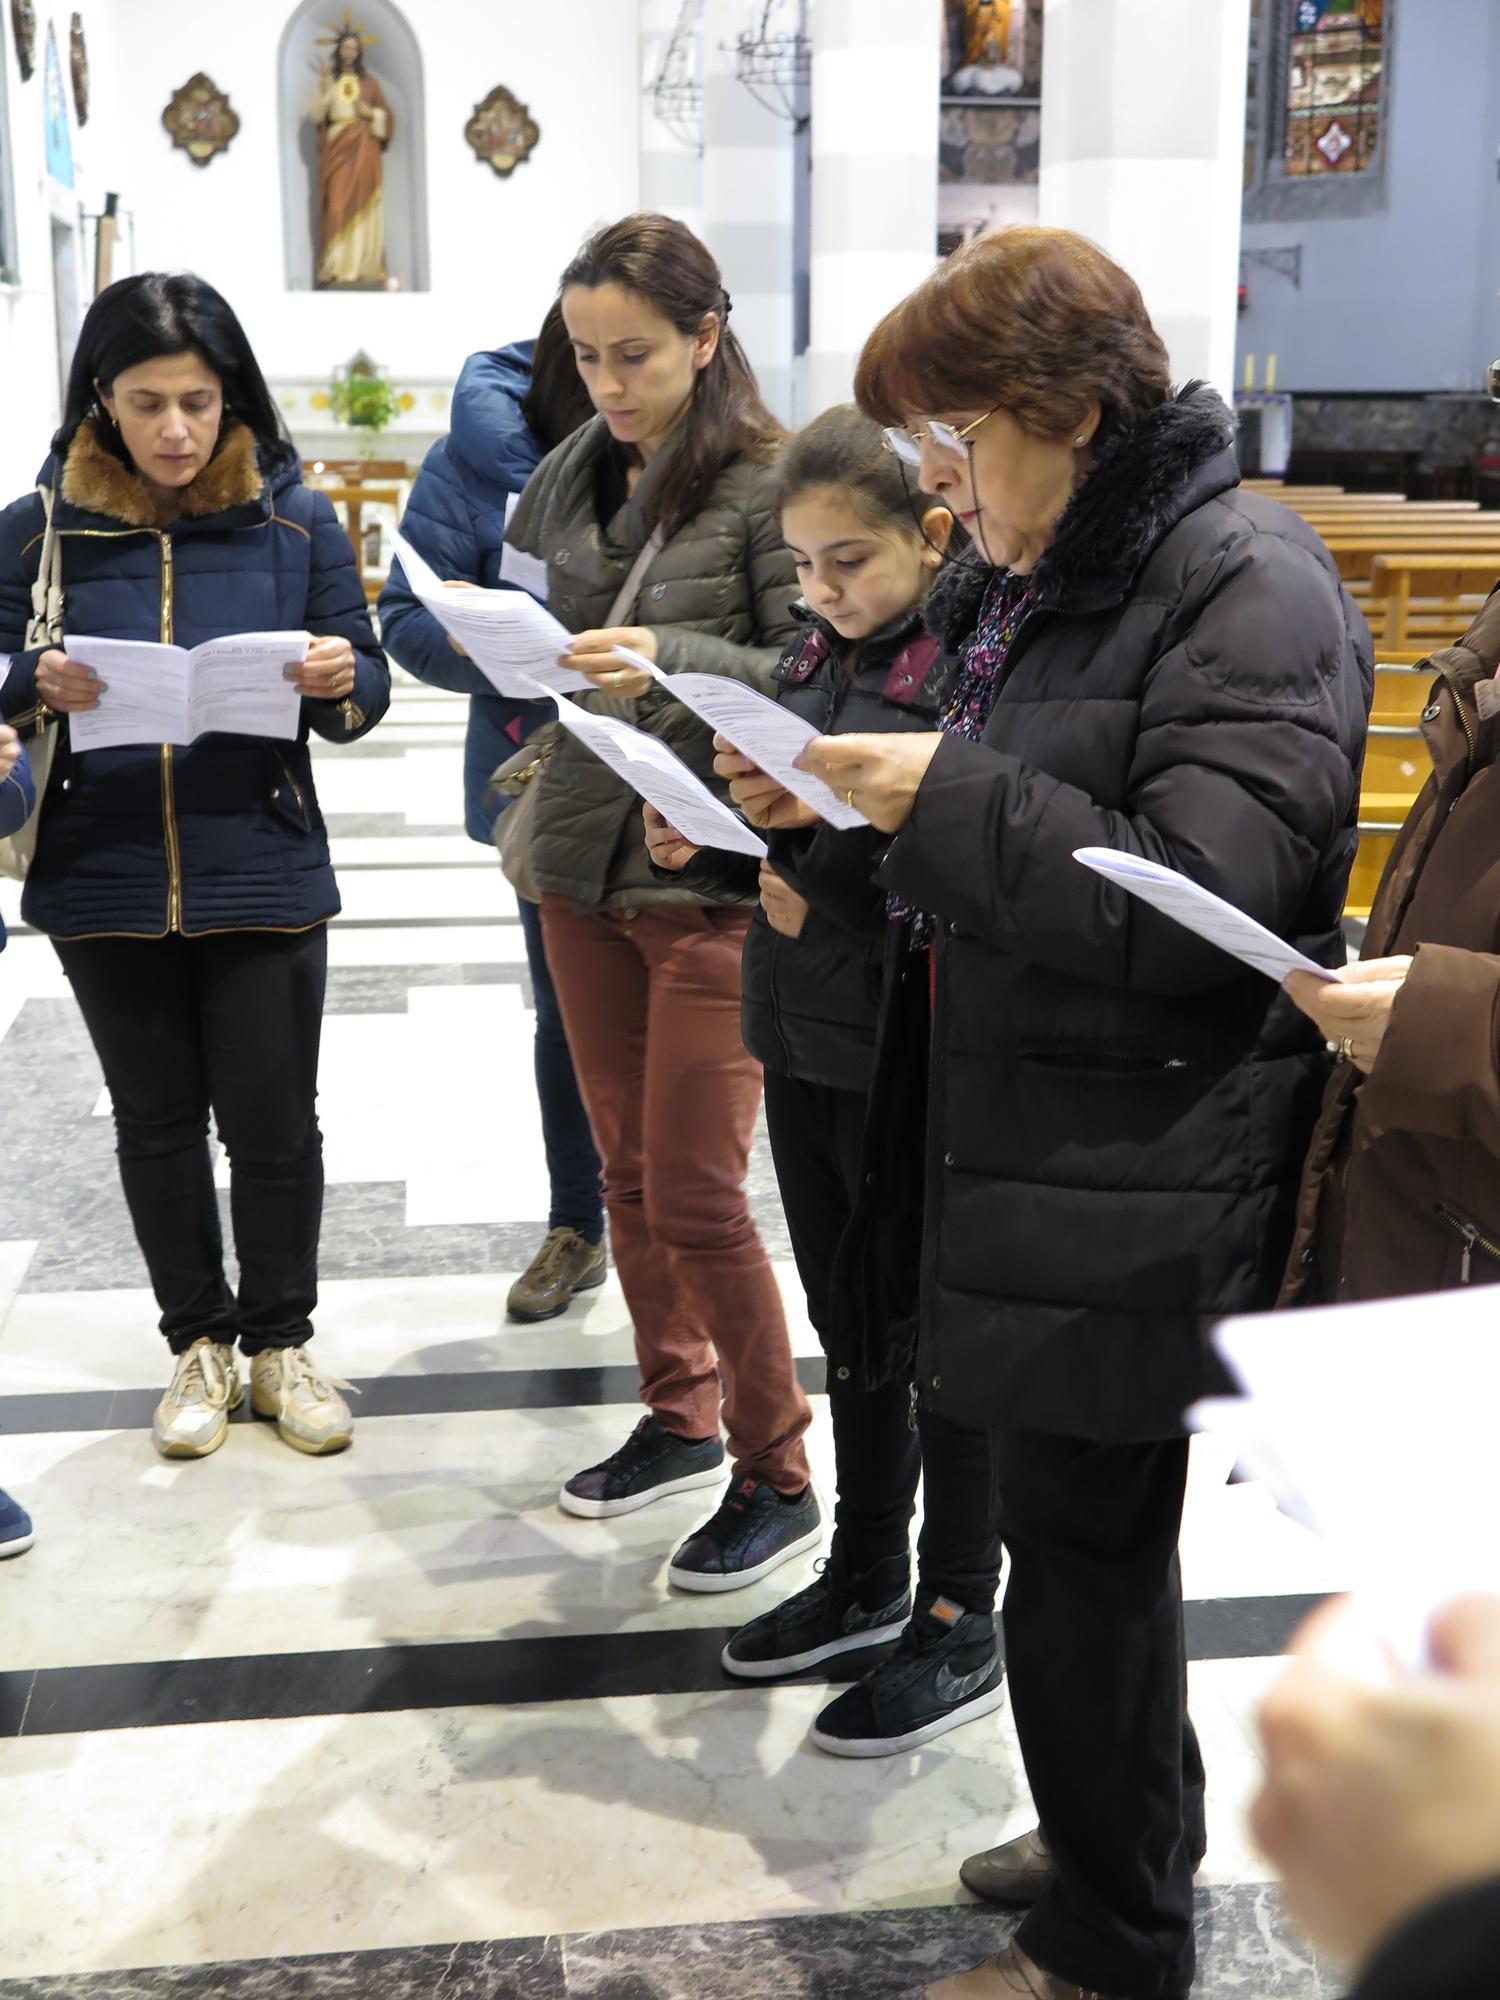 via-crucis-catechismo-2016-03-15-17-10-09